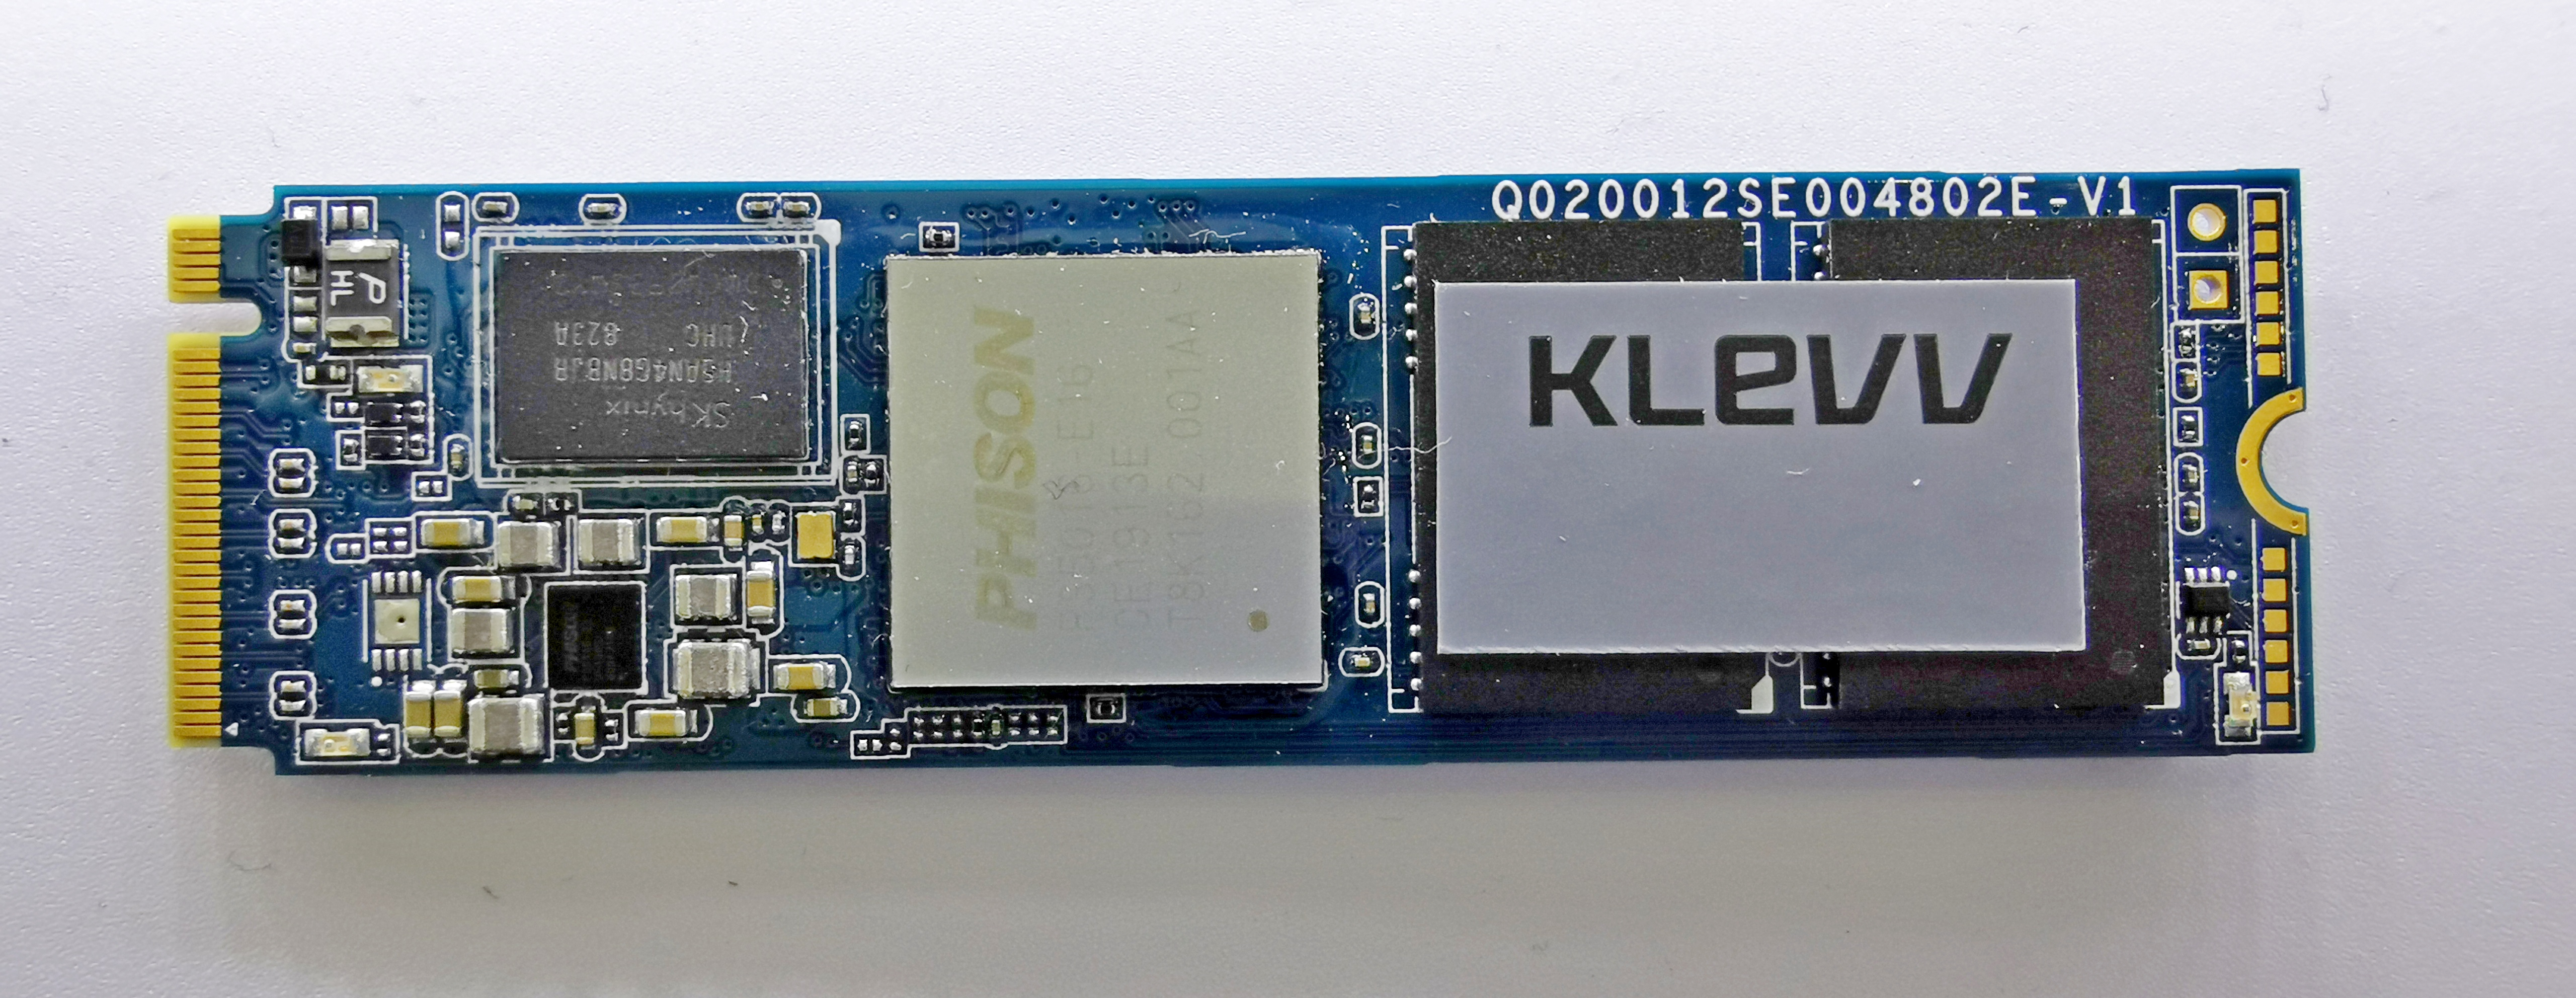 Essencore 2 TB PCIe 4 0 SSD Enters The Game